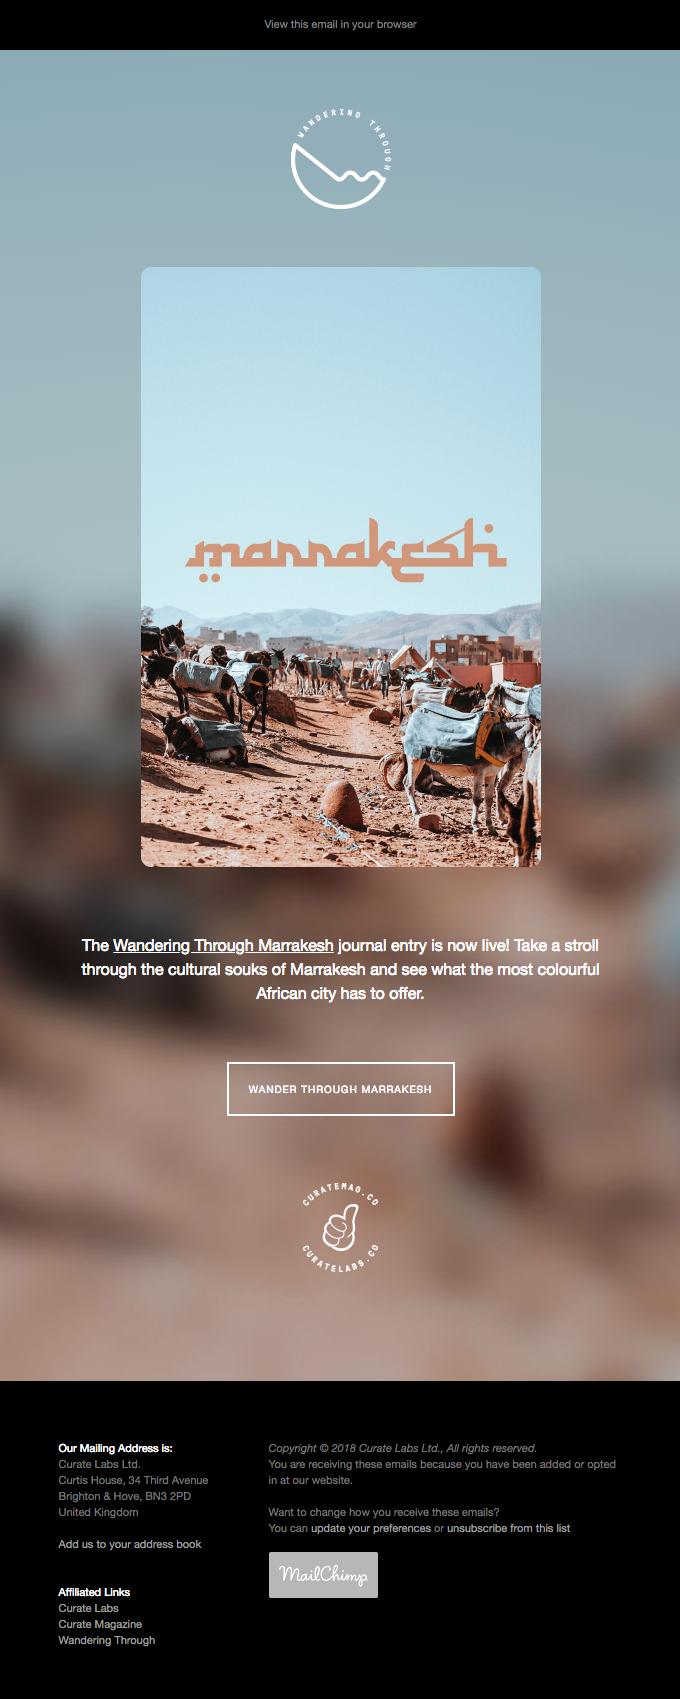 Wandering Through Marrakesh